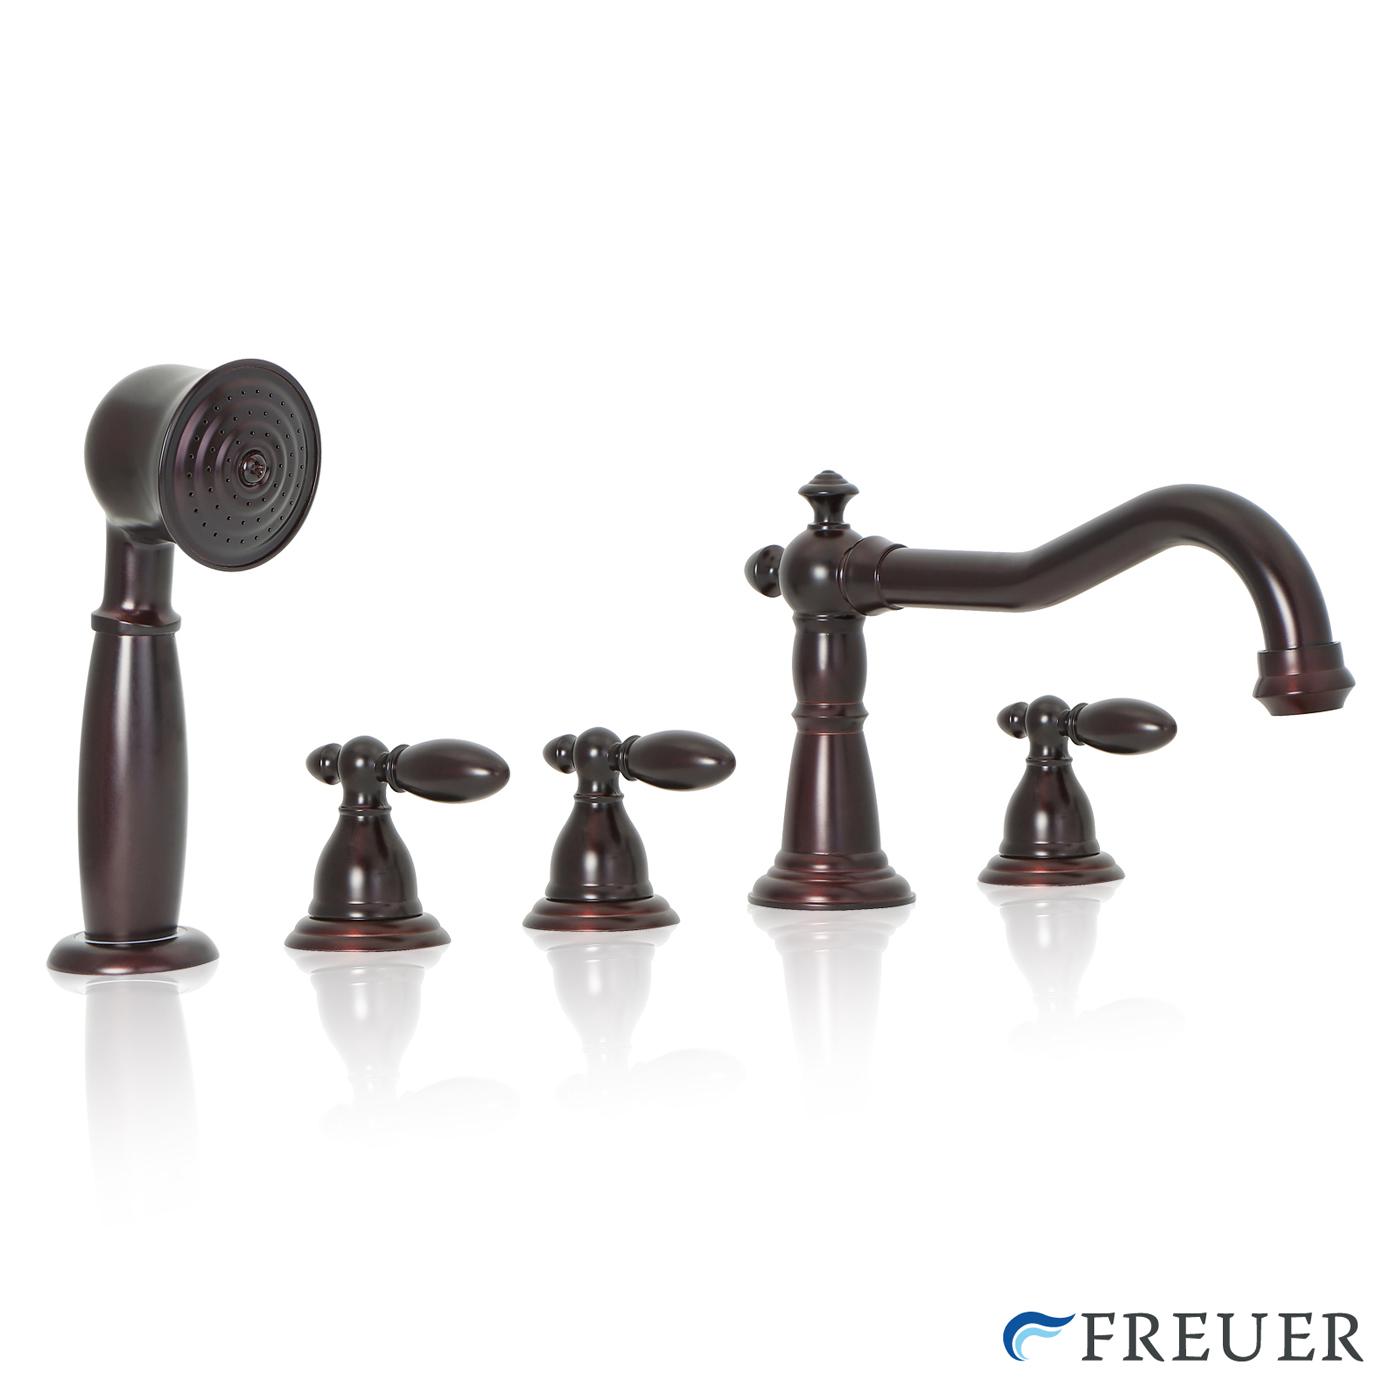 Bathtub Roman Tub Faucet Spout W Hand Shower Spray Oil Rubbed Bronze EBay